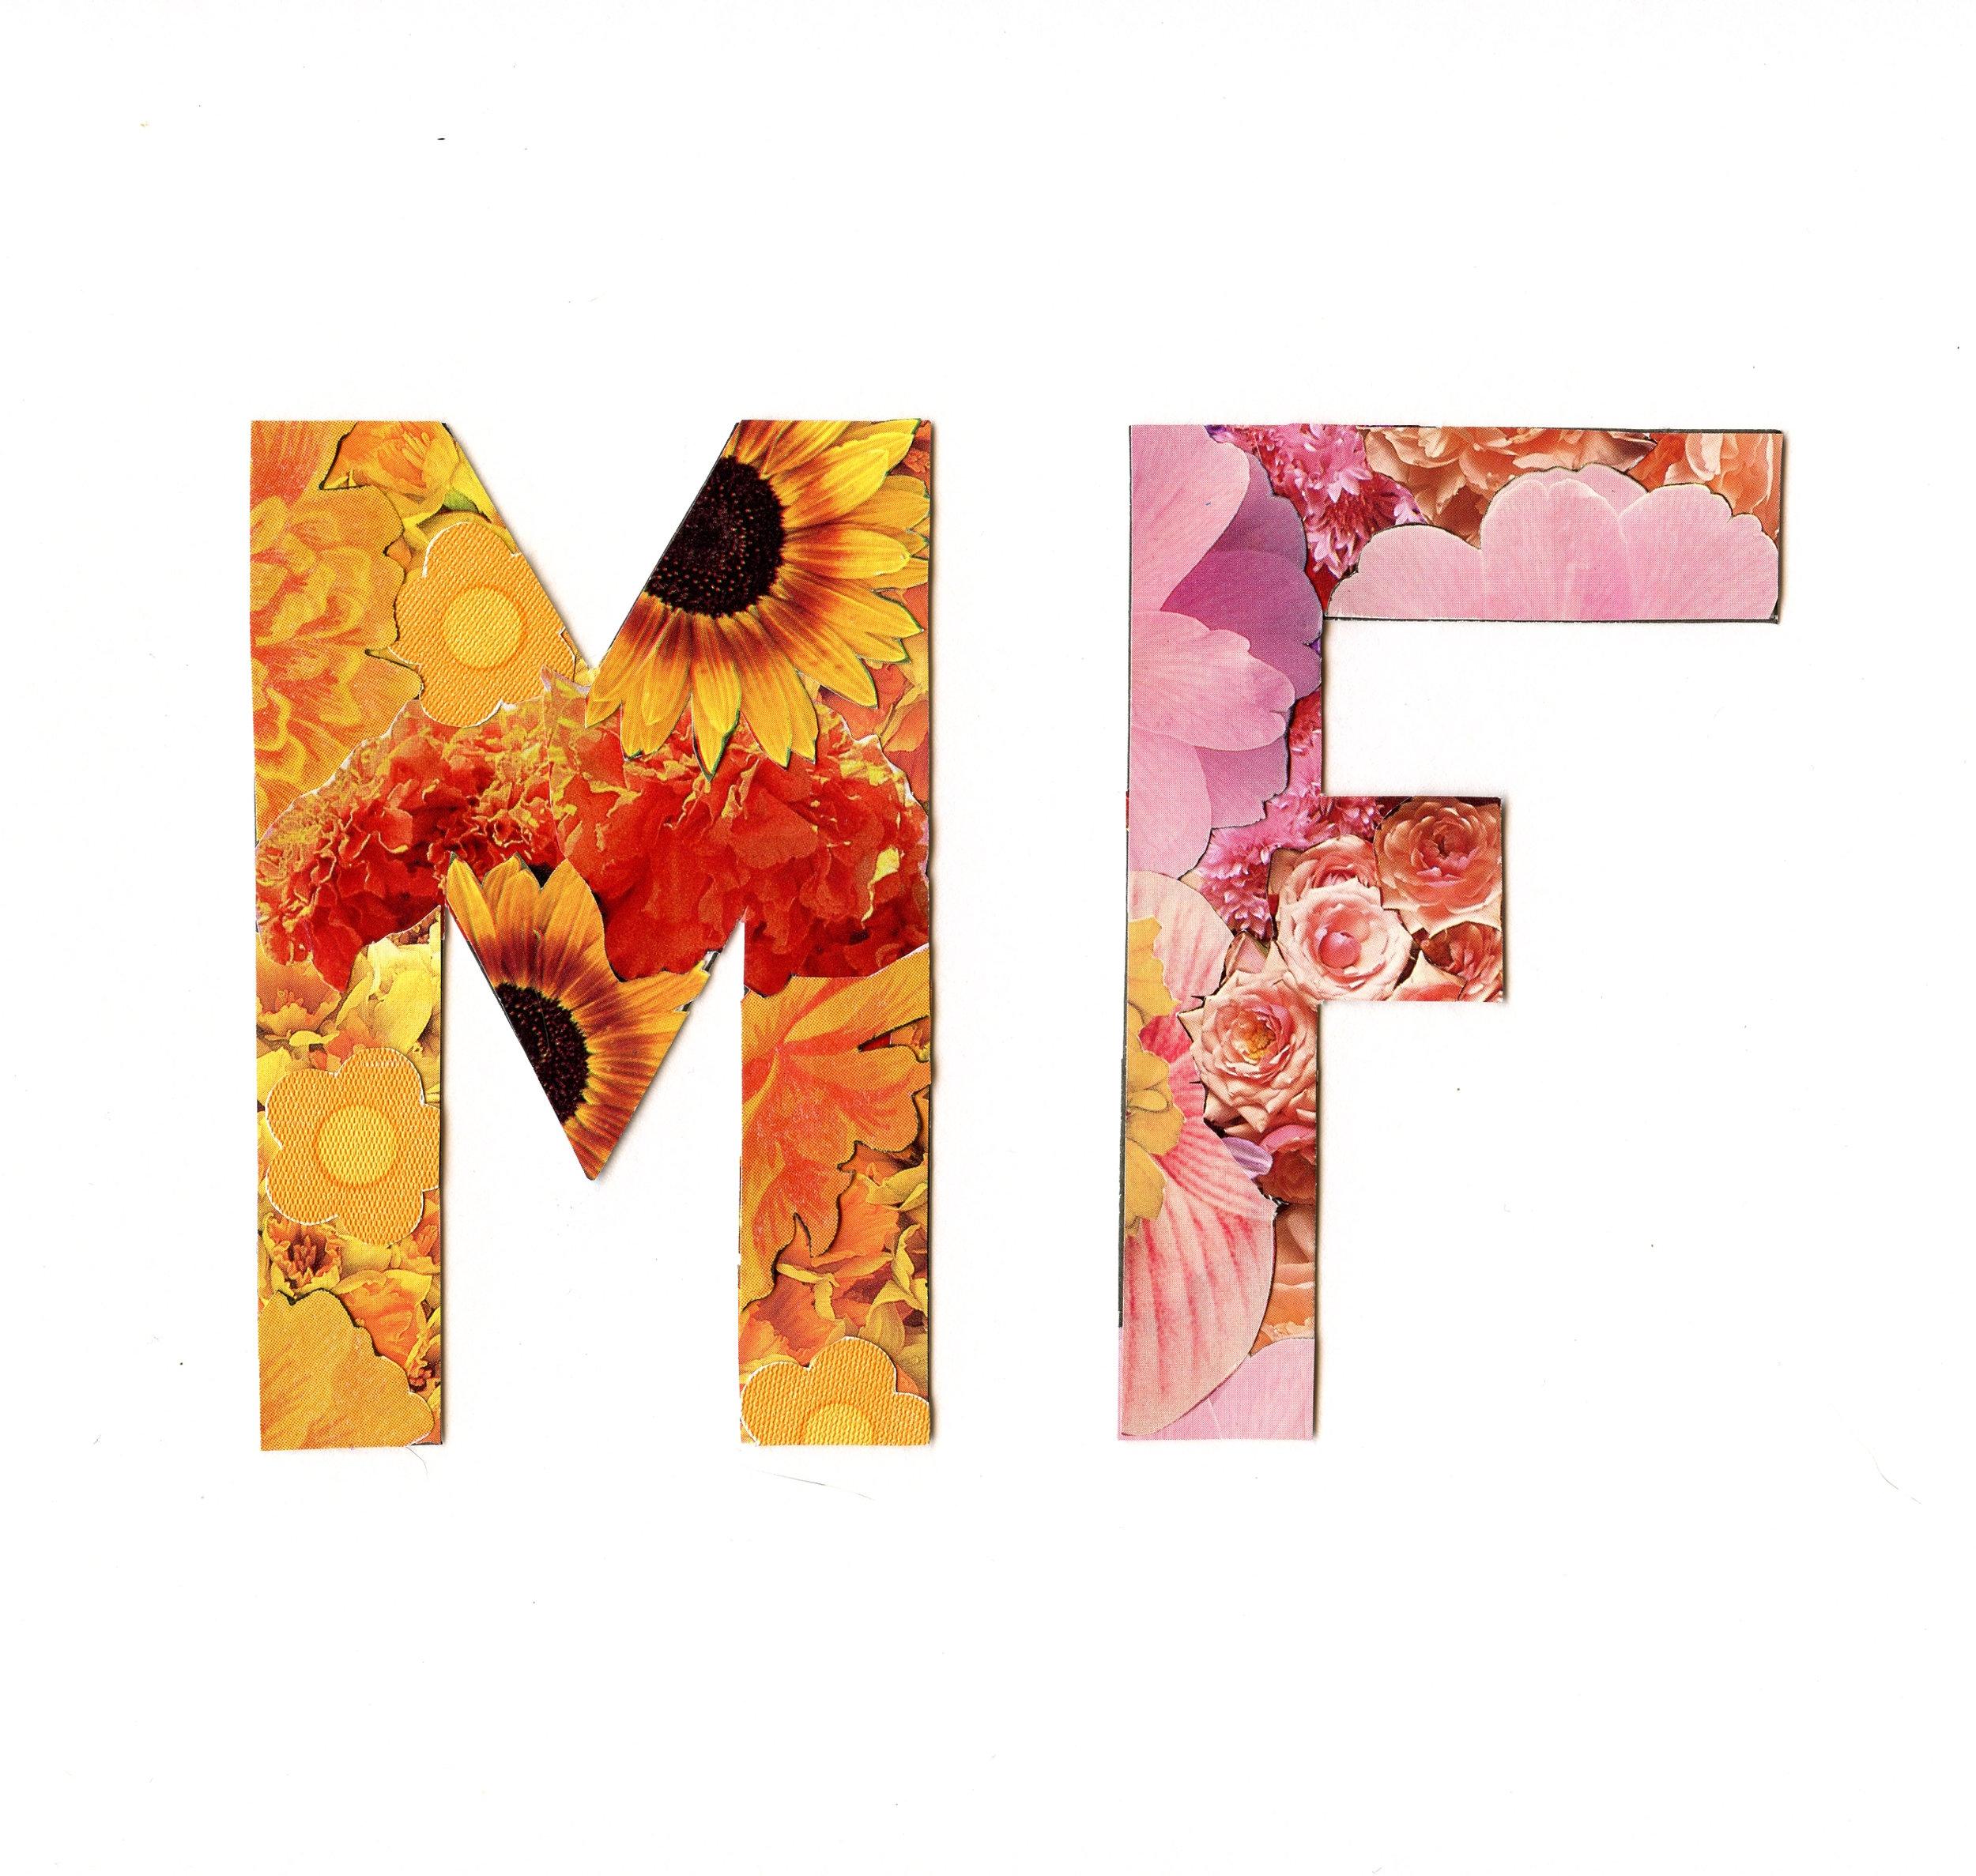 MF_logo_square_collage.jpg